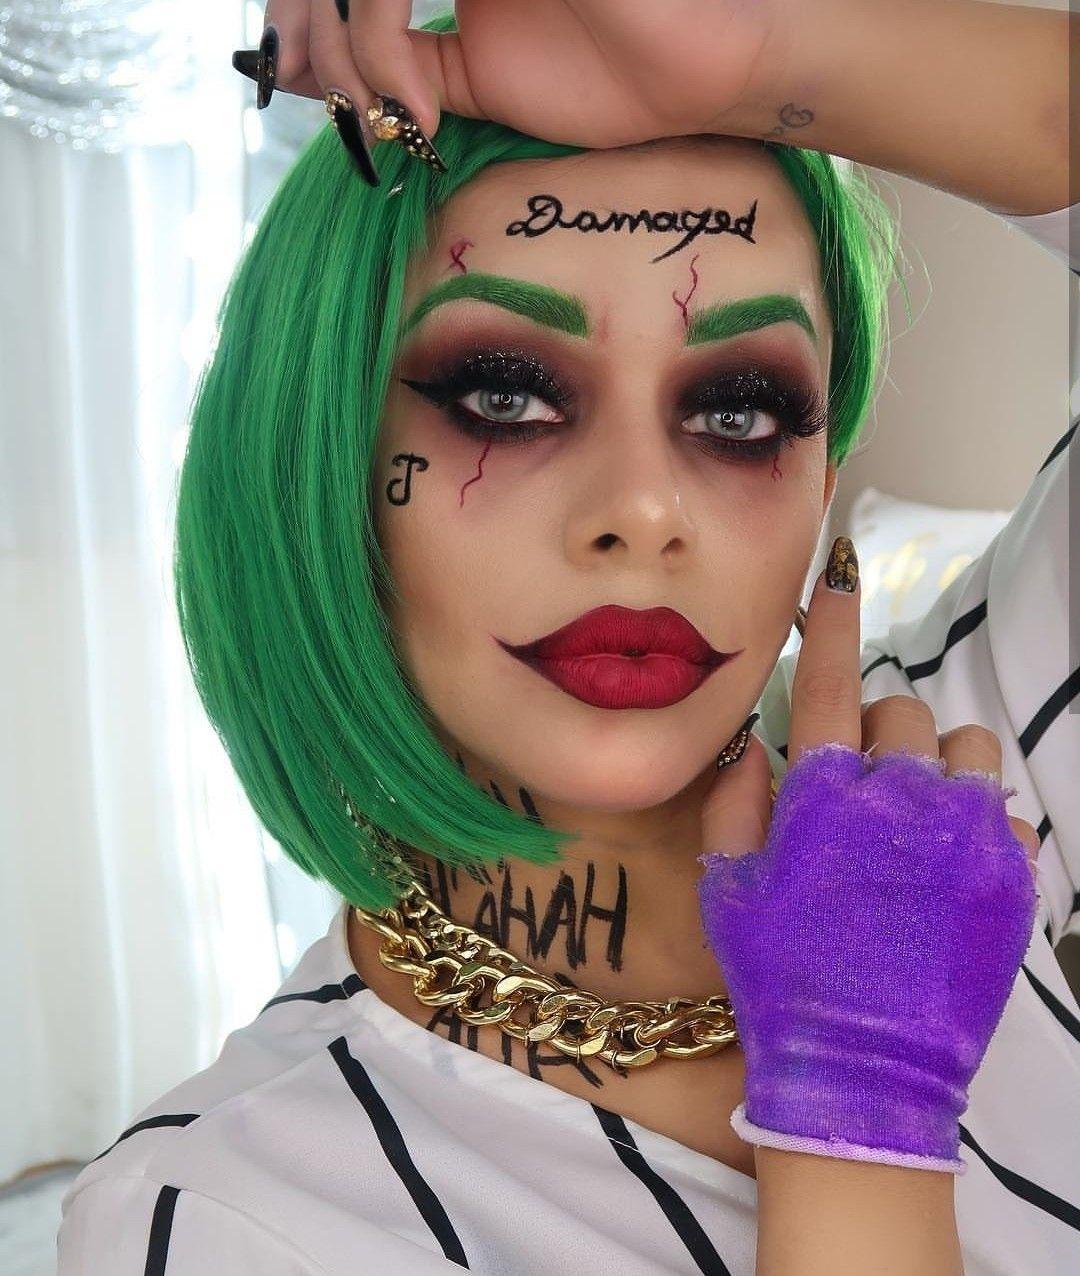 Maquillaje Artístico Maquillaje de joker, Disfraces